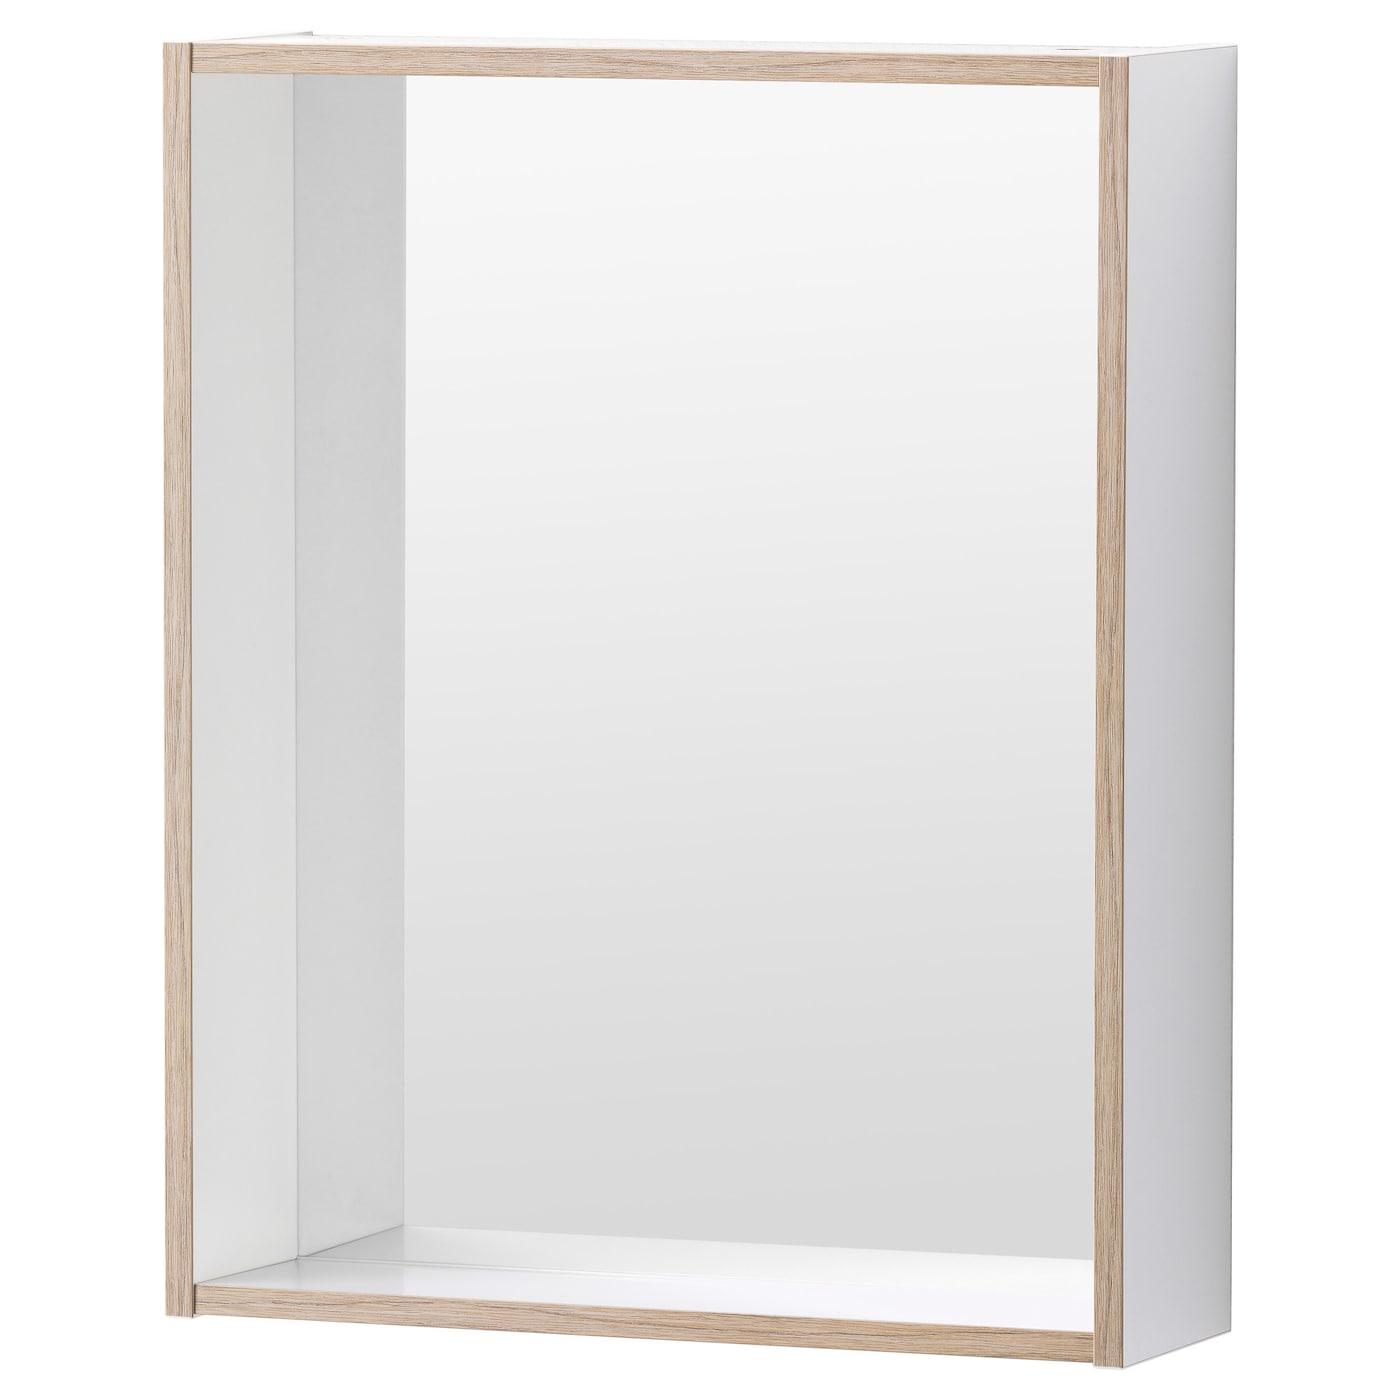 IKEA TYNGEN Mirror With Shelf Perfect In A Small Bathroom